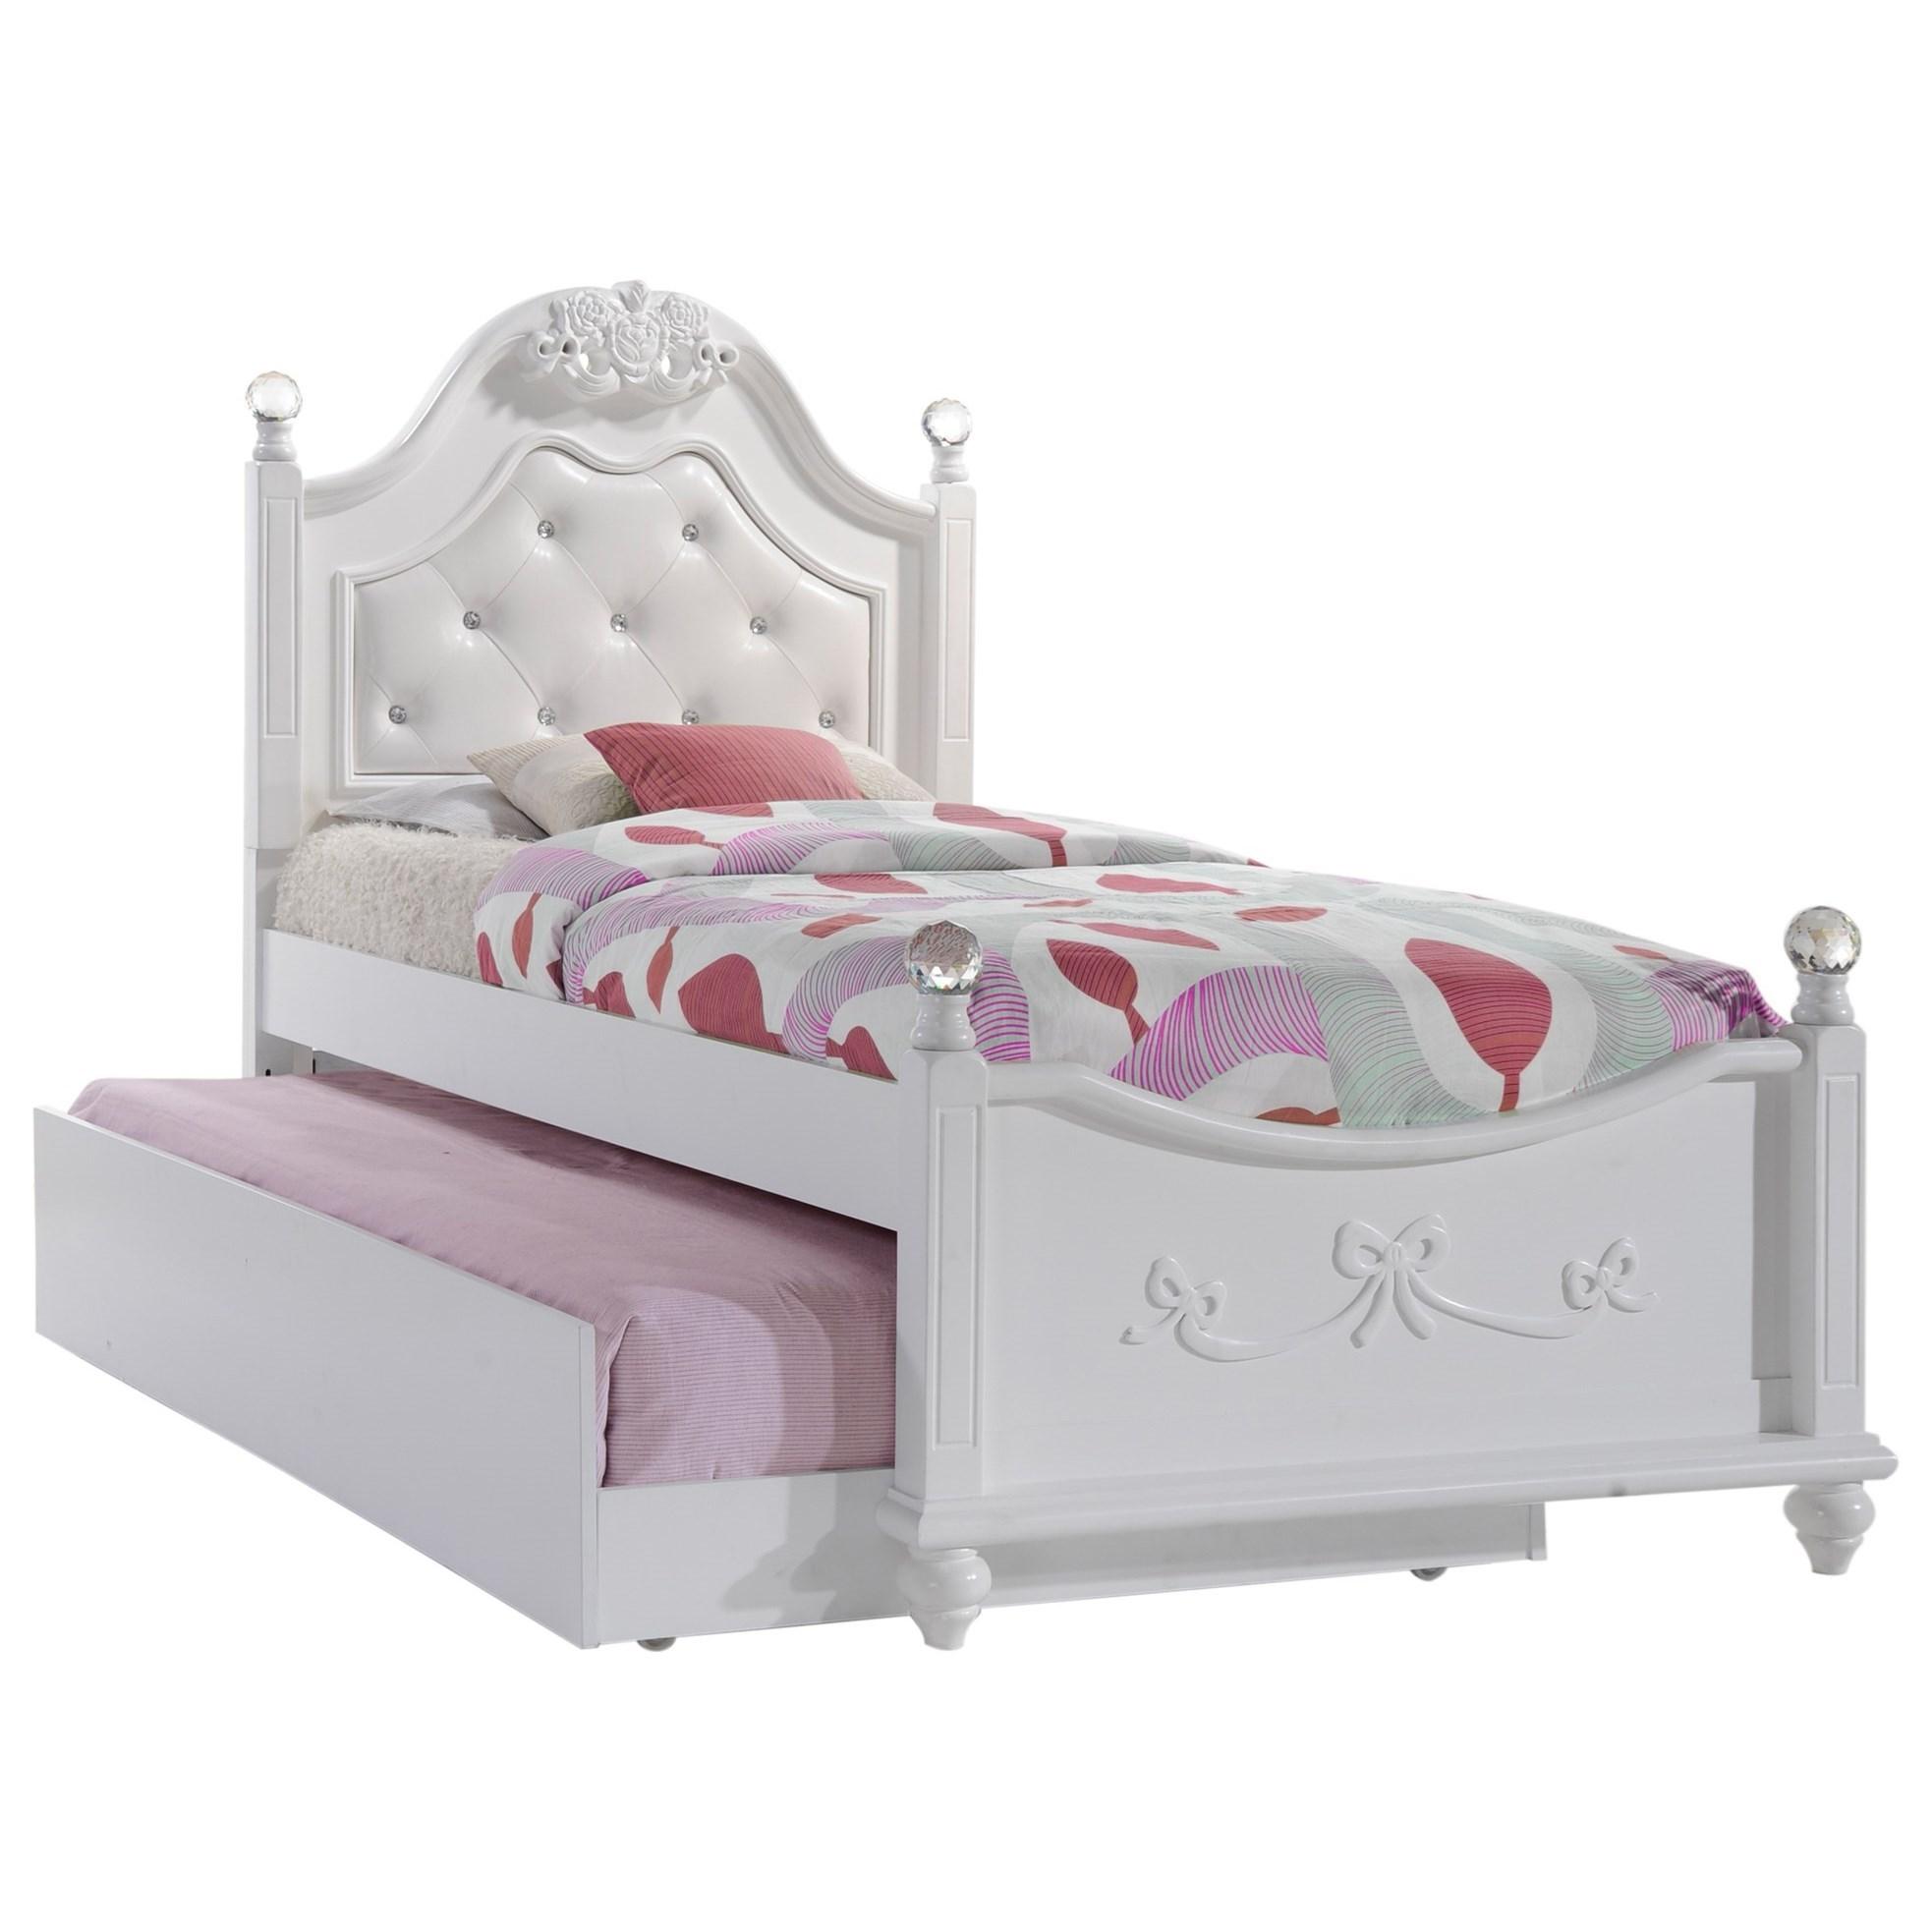 Twin Platform Bed w/ Storage Trundle